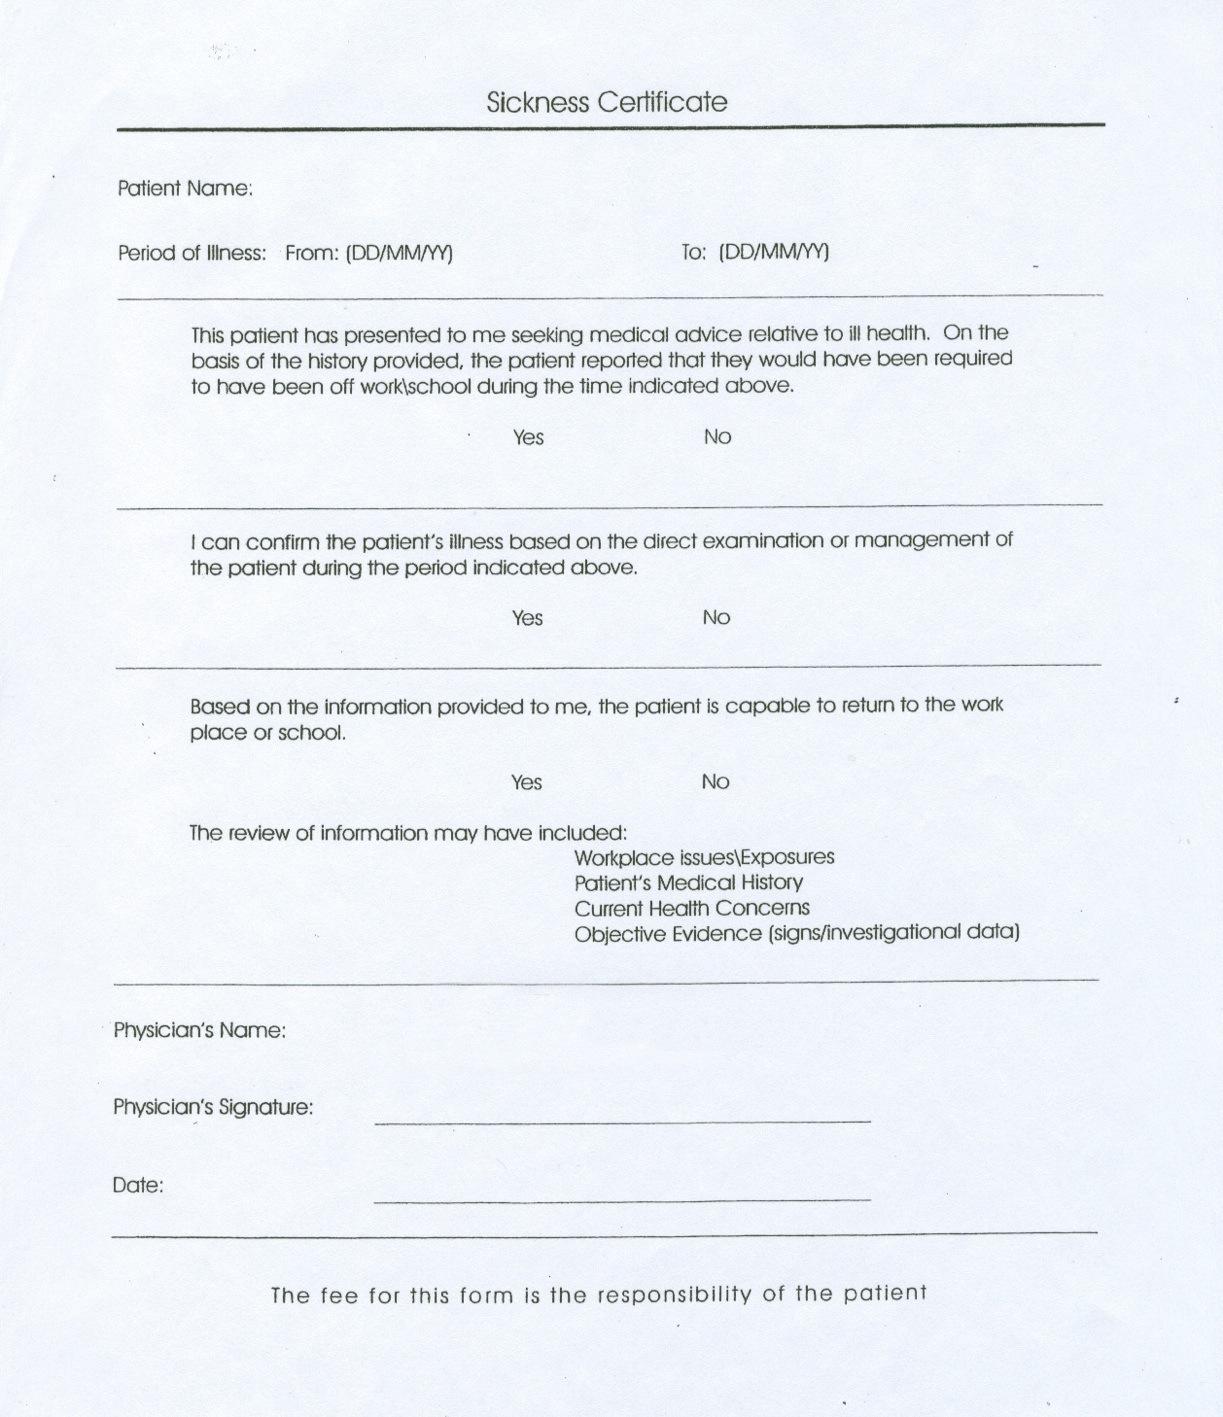 Medical Certificate Of Sickness Zrom